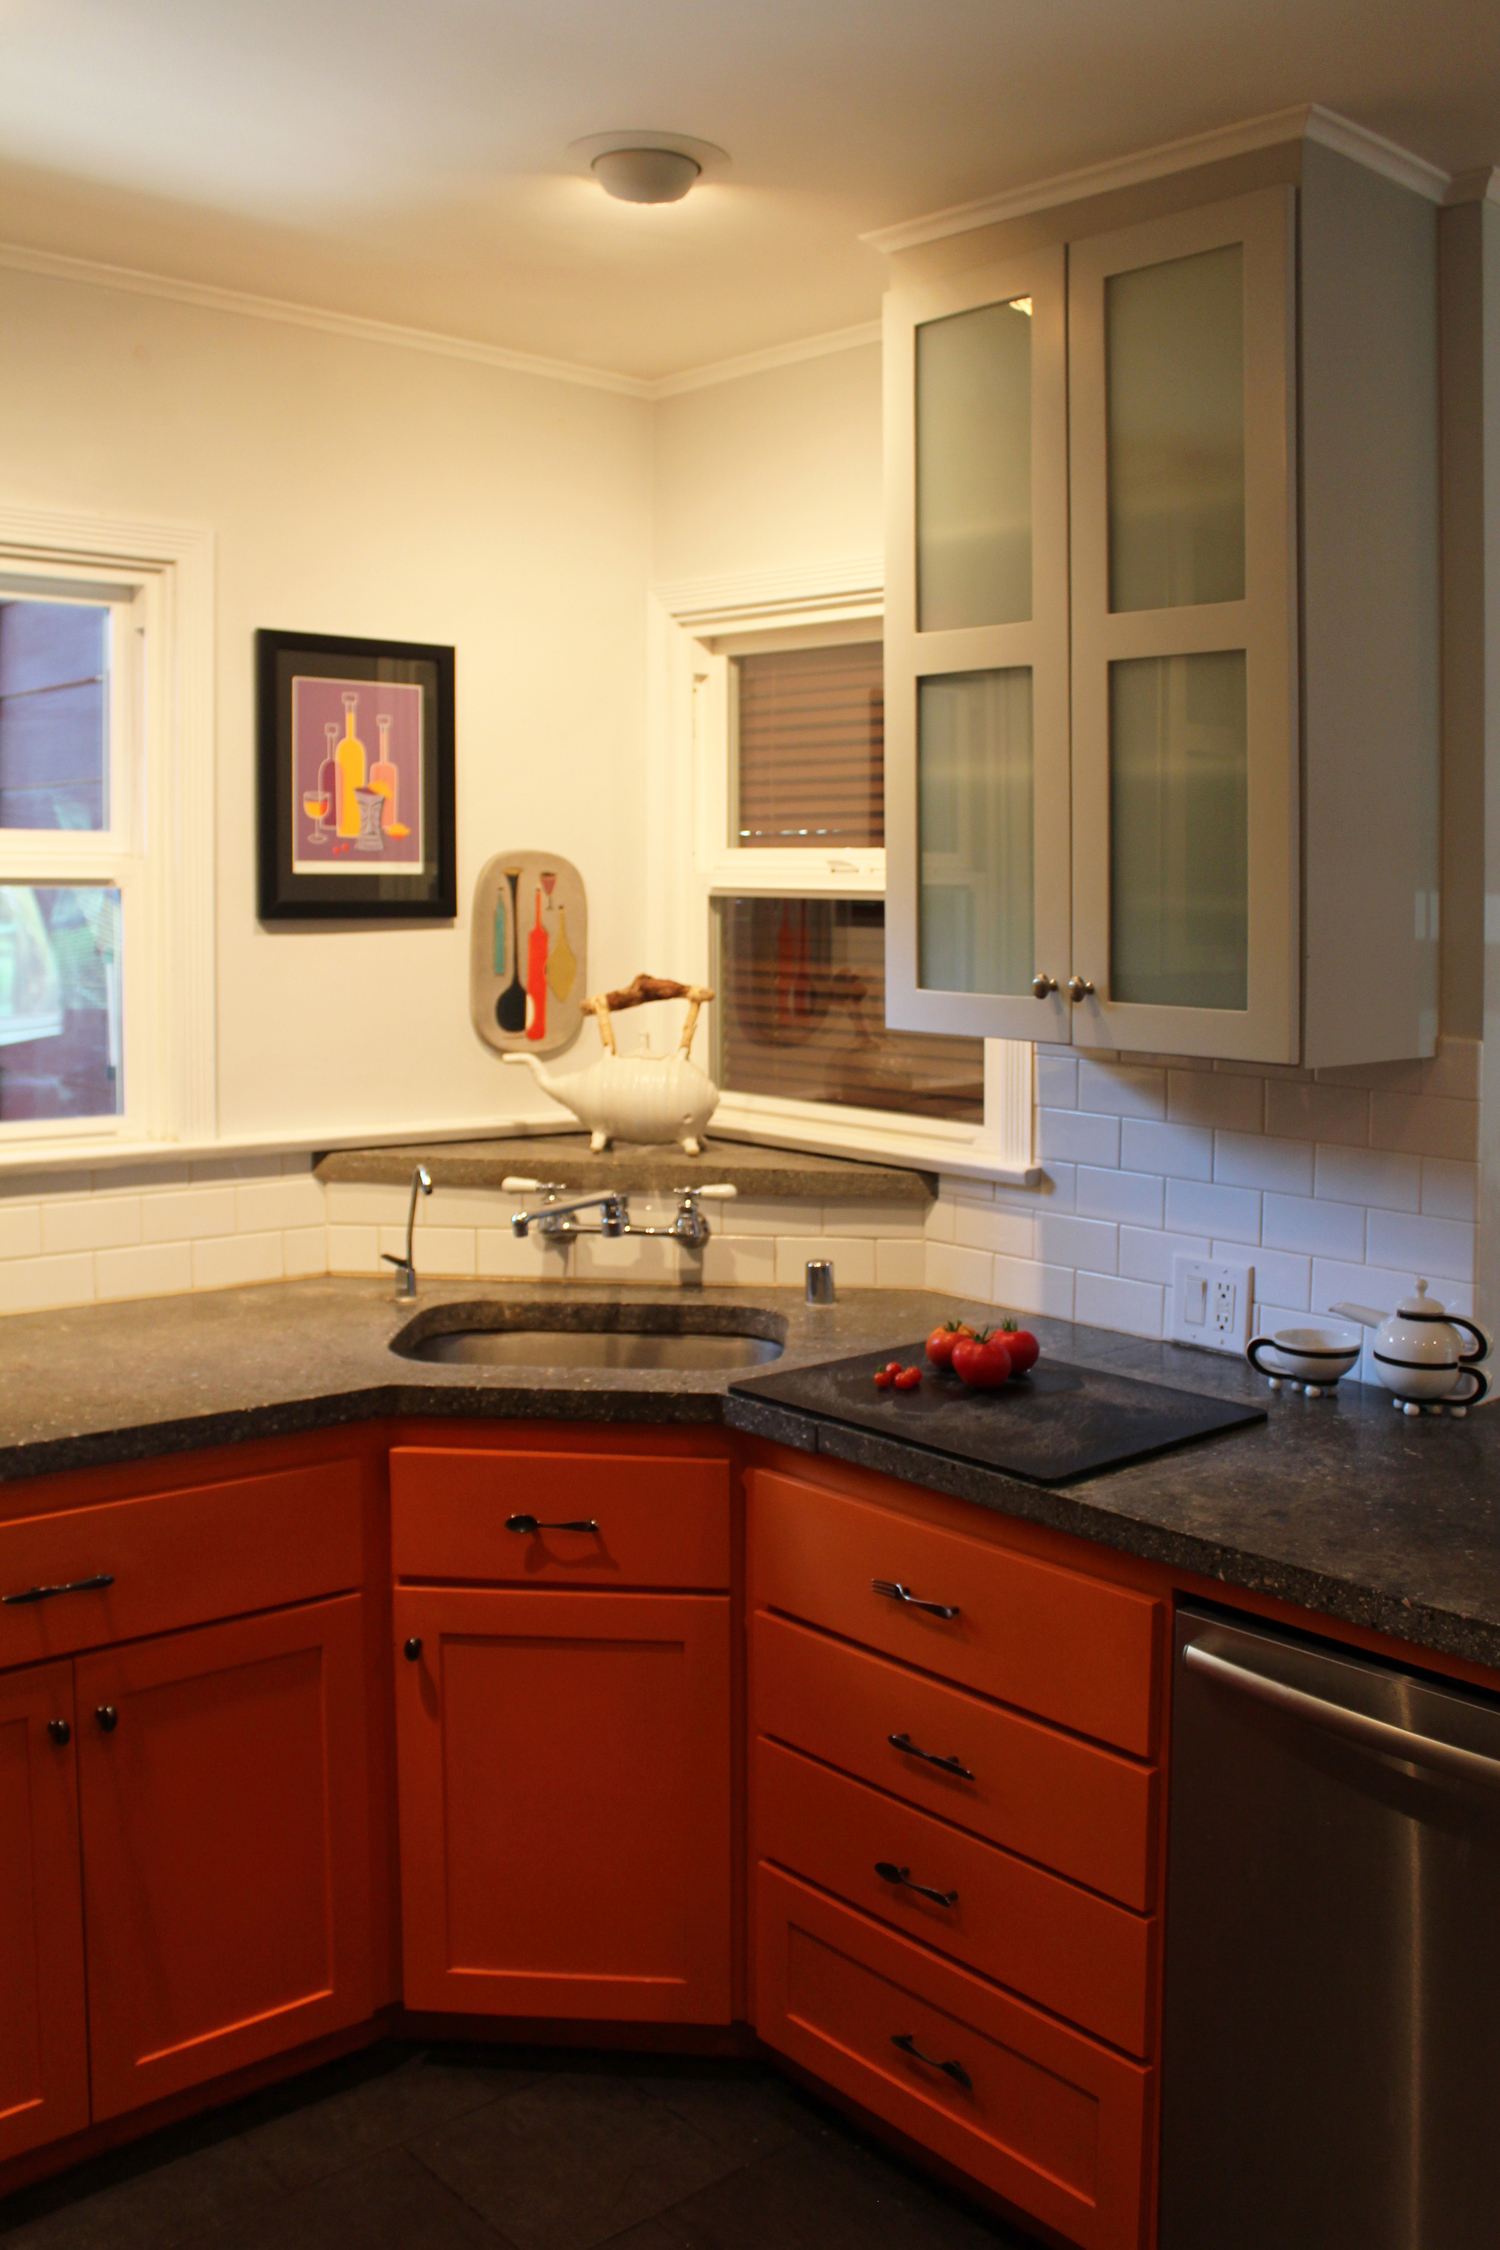 burbank kitchen3small.jpg